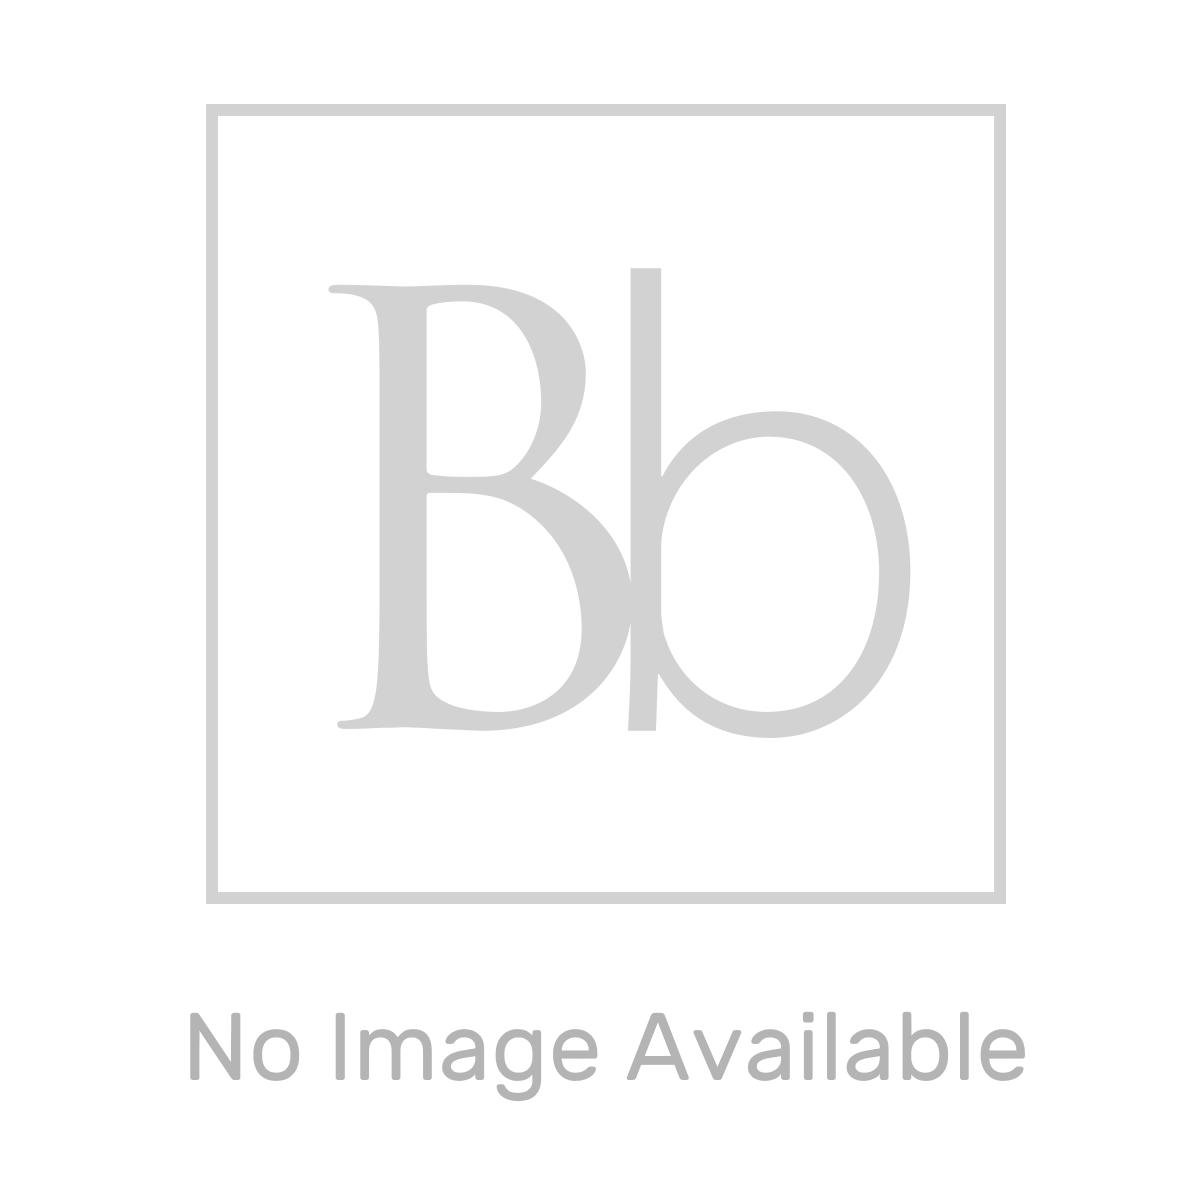 BTL Lucia Grey Ash Floor Standing Vanity Unit with Basin 610mm